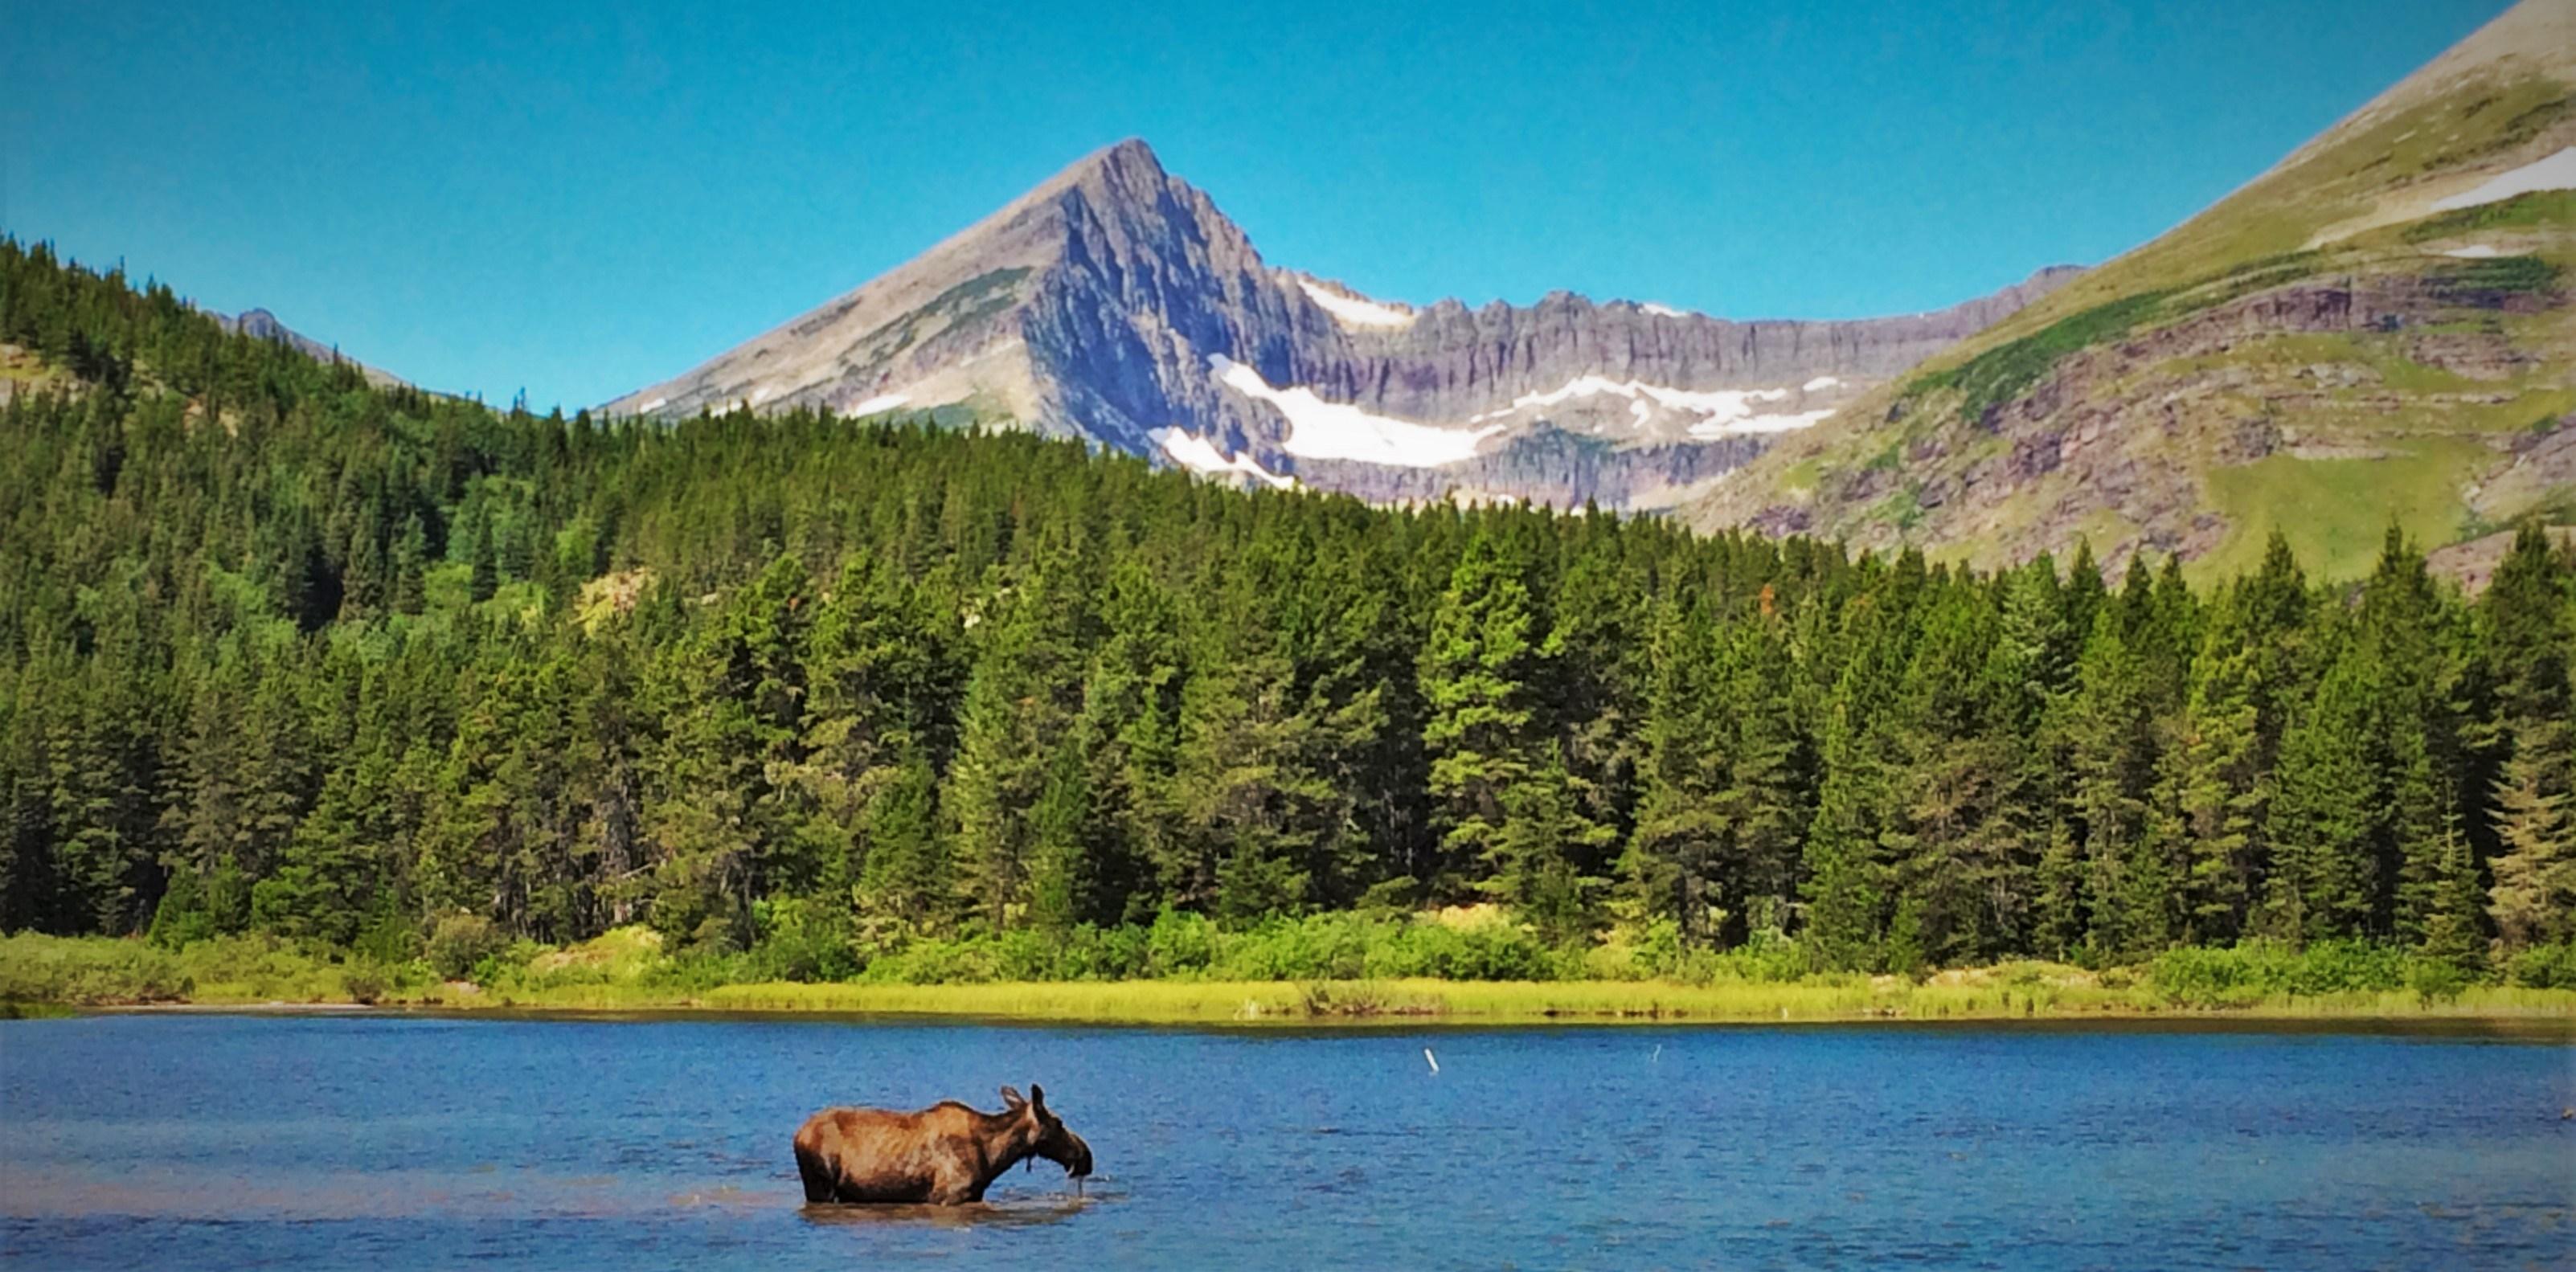 Cow moose in Fishercap Lake, Glacier National Monument, Montana.